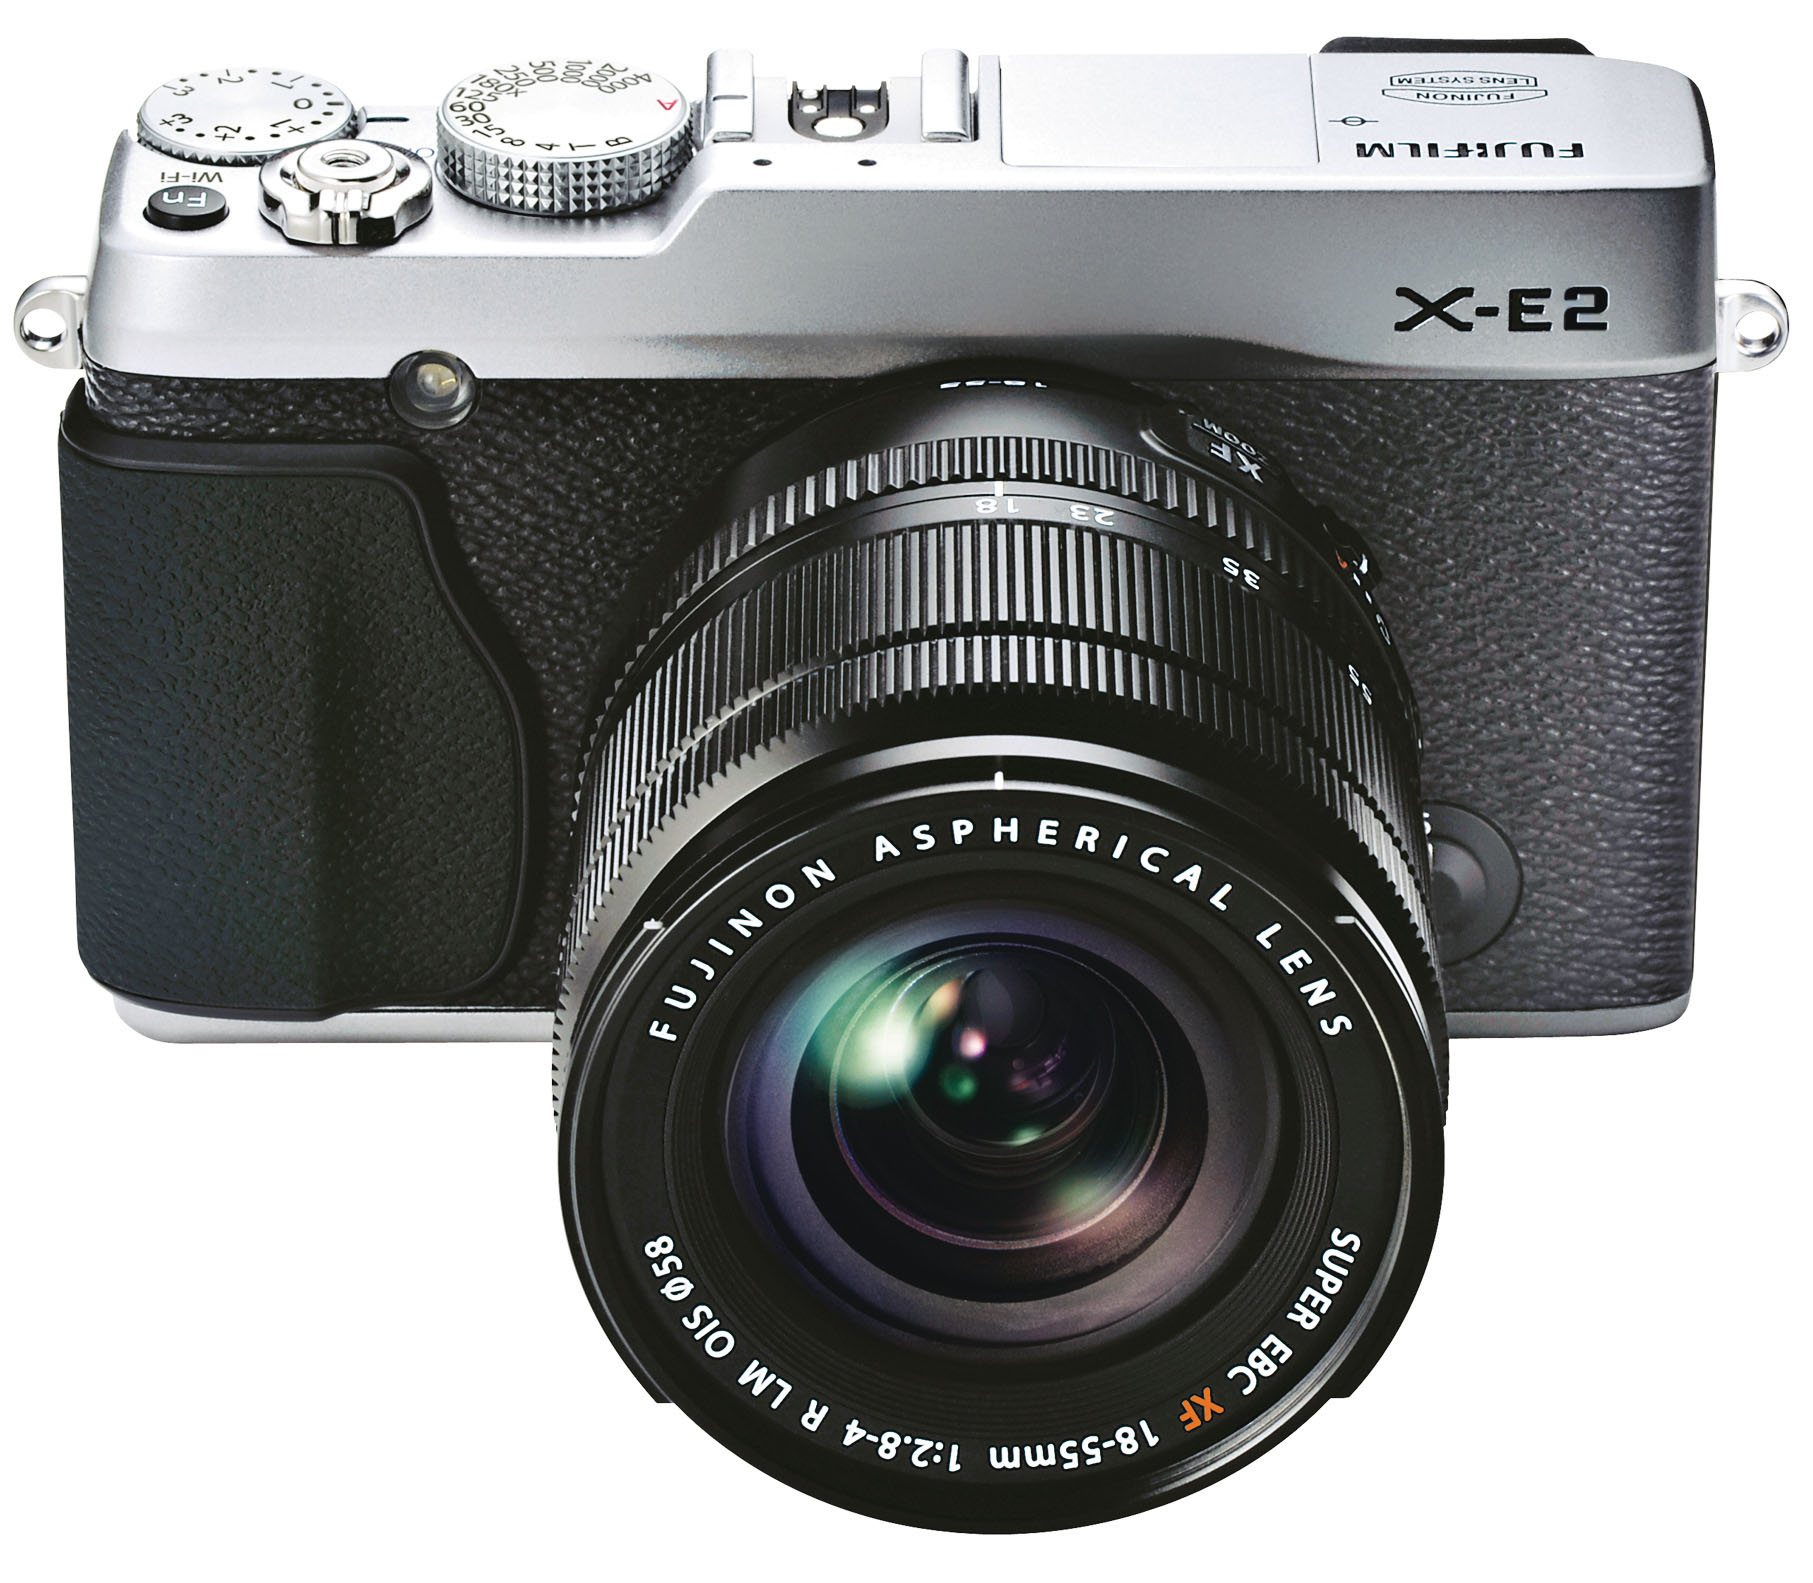 FujifimX-E2-Front.jpg